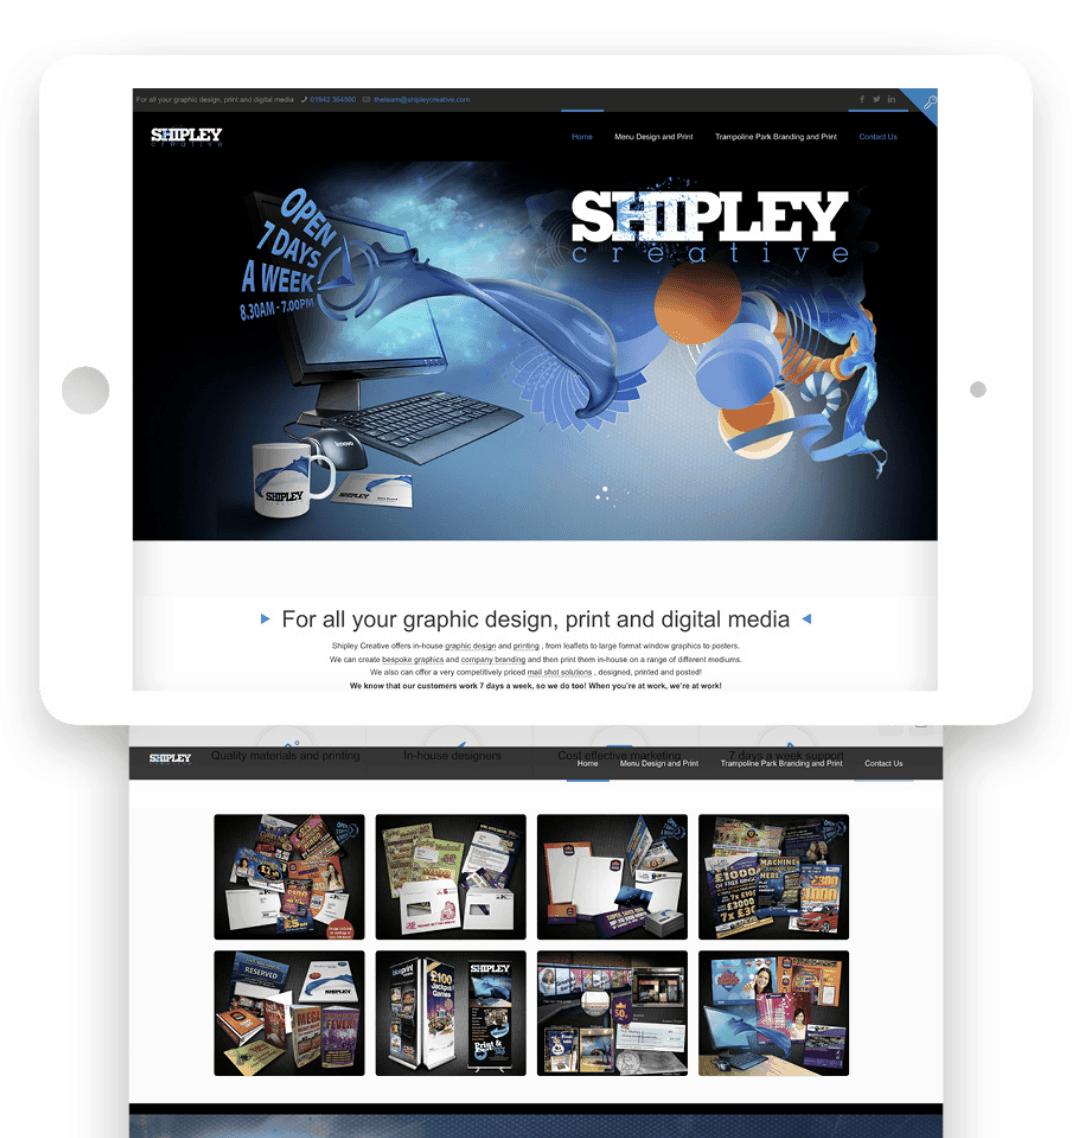 Shipley Creative Website home page